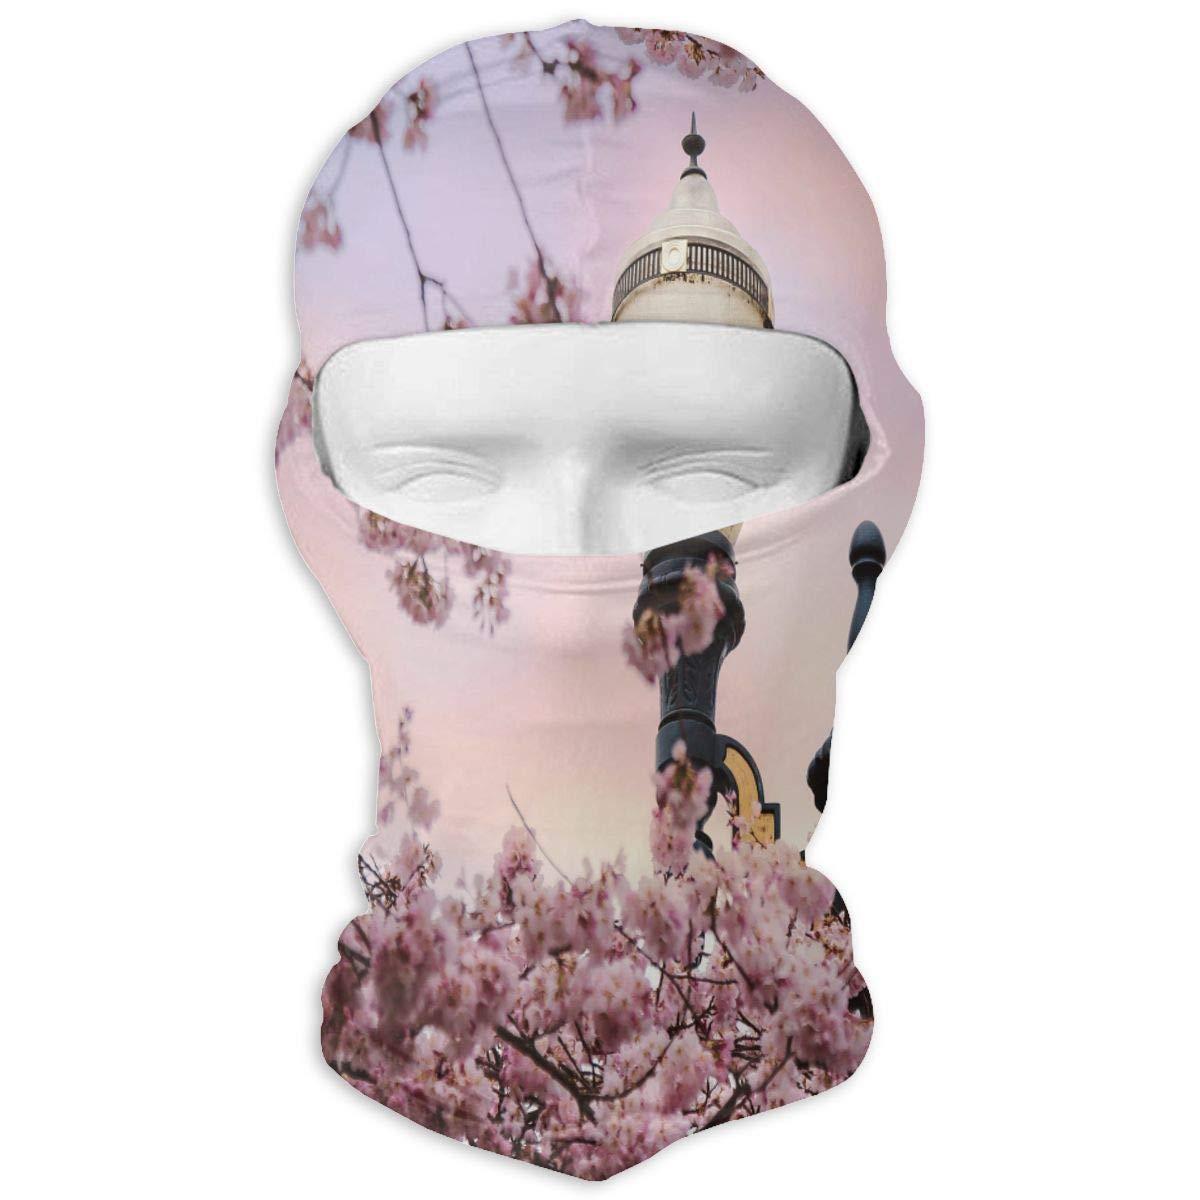 Balaclava Peach Flower Street Light Full Face Masks UV Protection Ski Hat Womens Neck Warmer for Outdoor